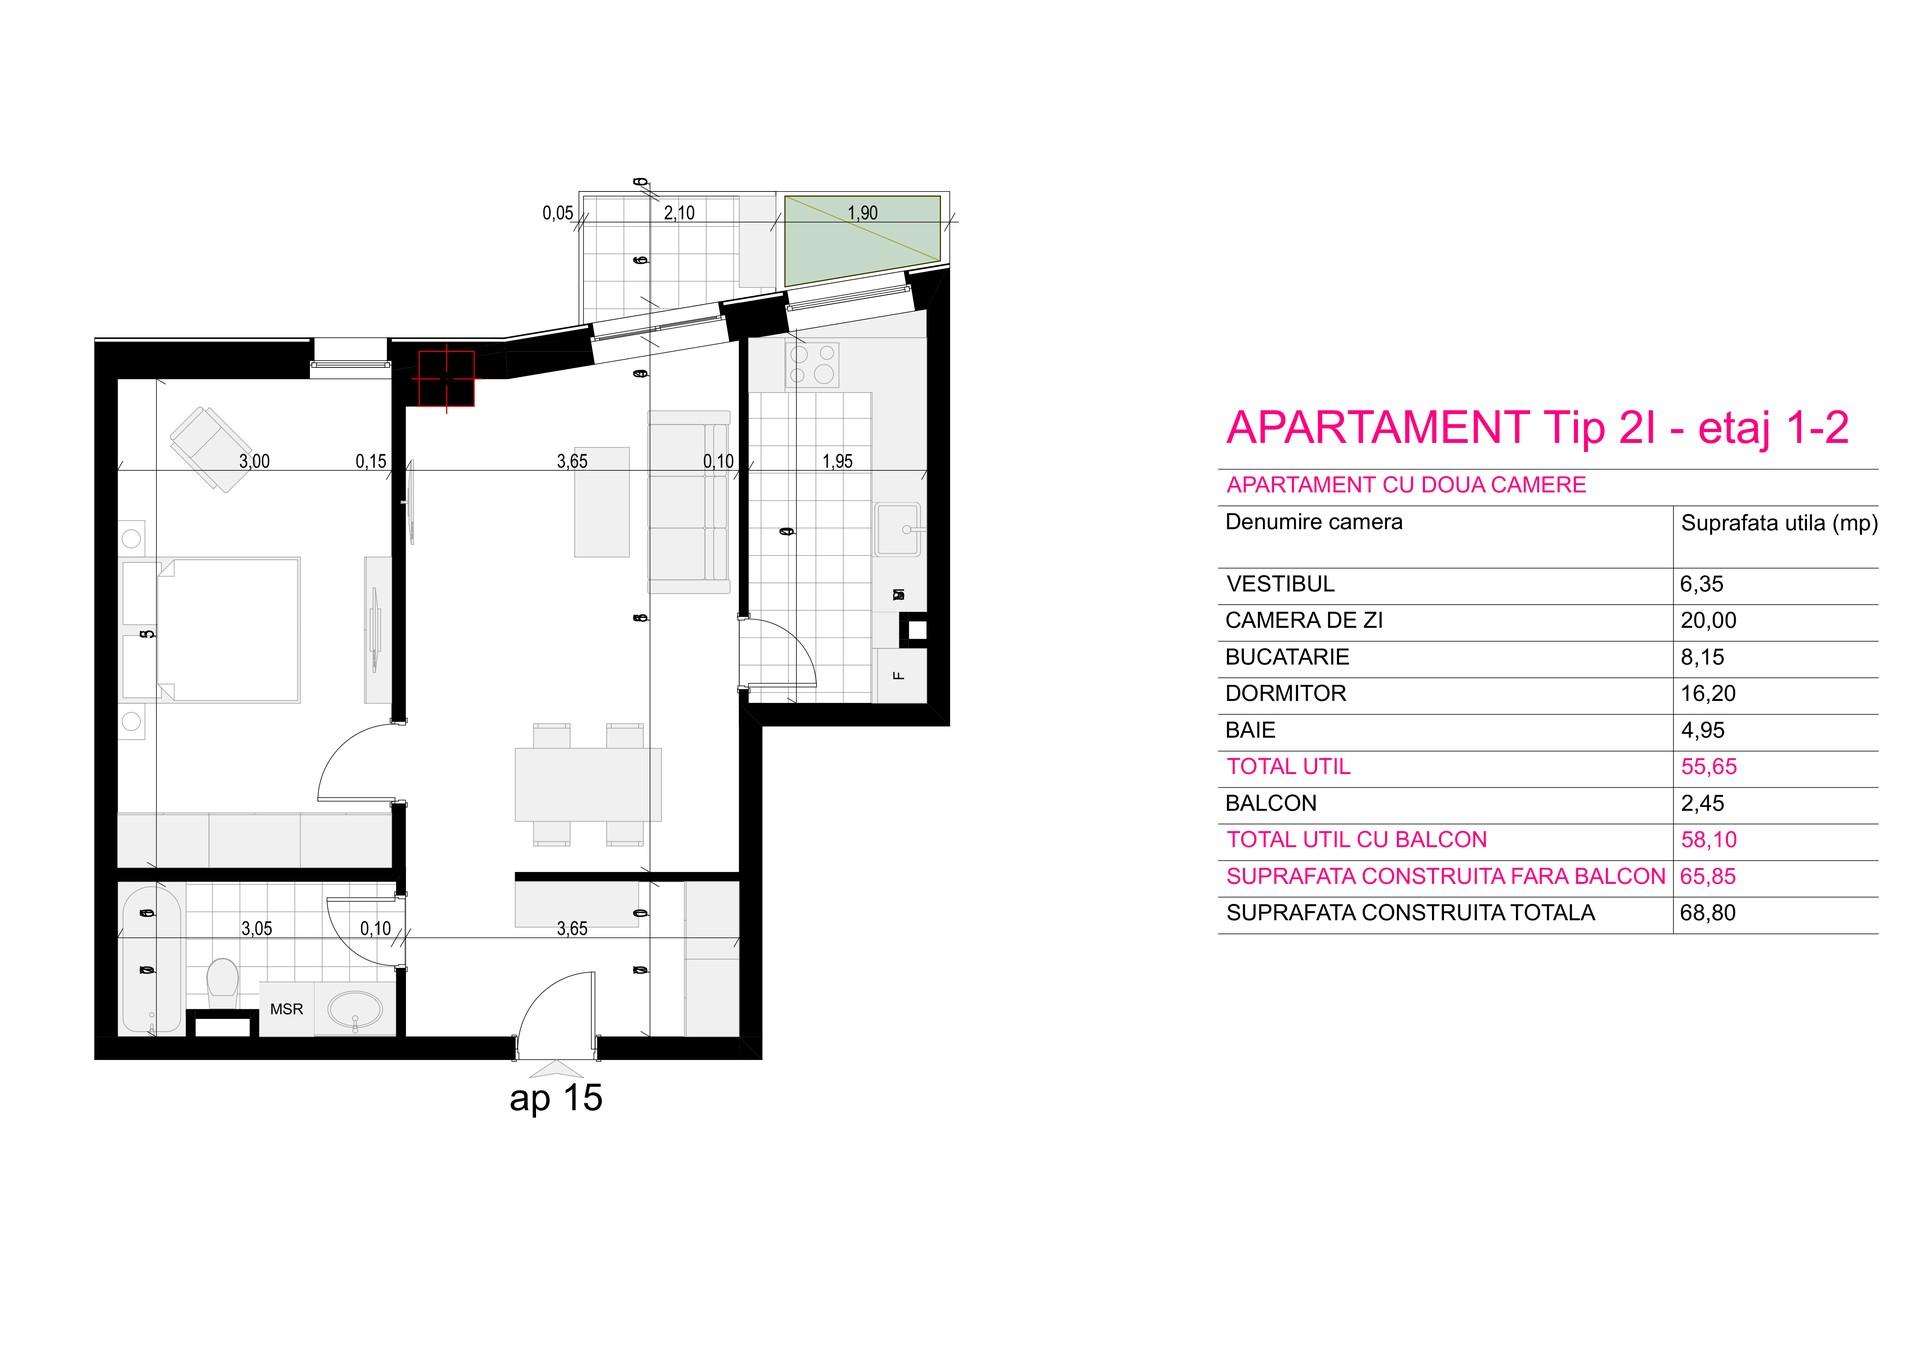 Ap Corp A Tip 2I etaj 1-2 - Aviatorii Residence